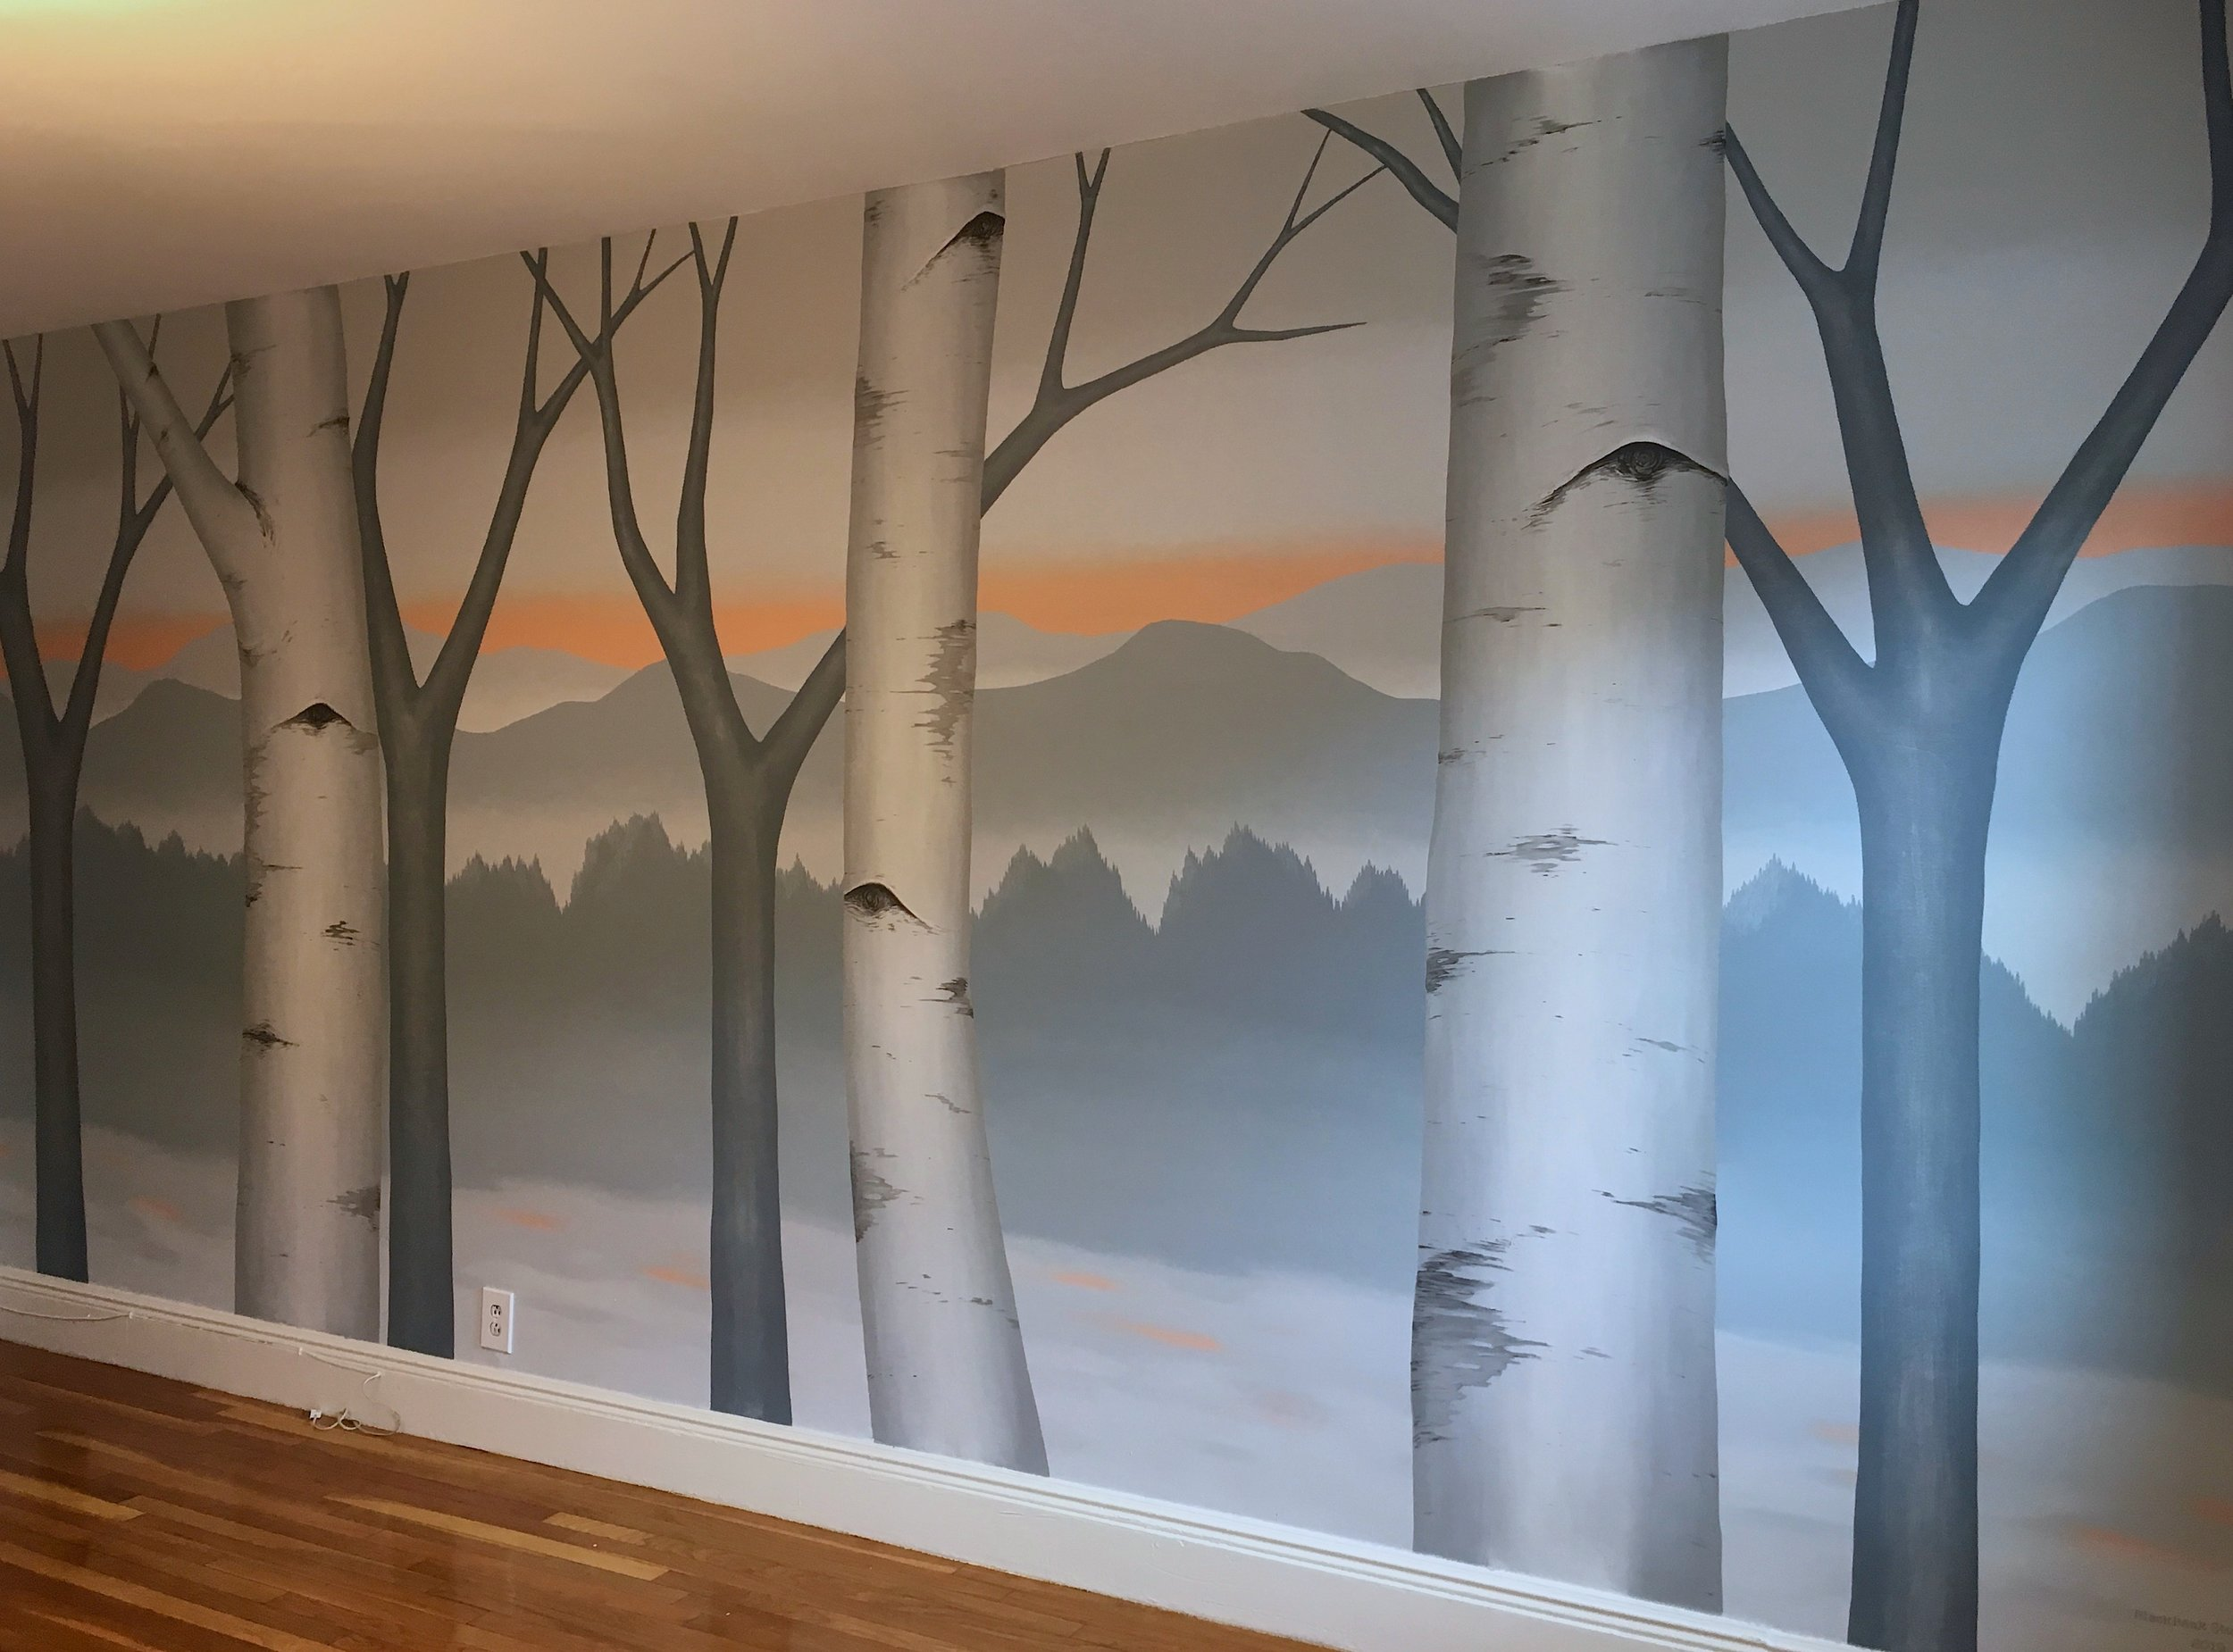 Master bedroom mural in Brookline, MA